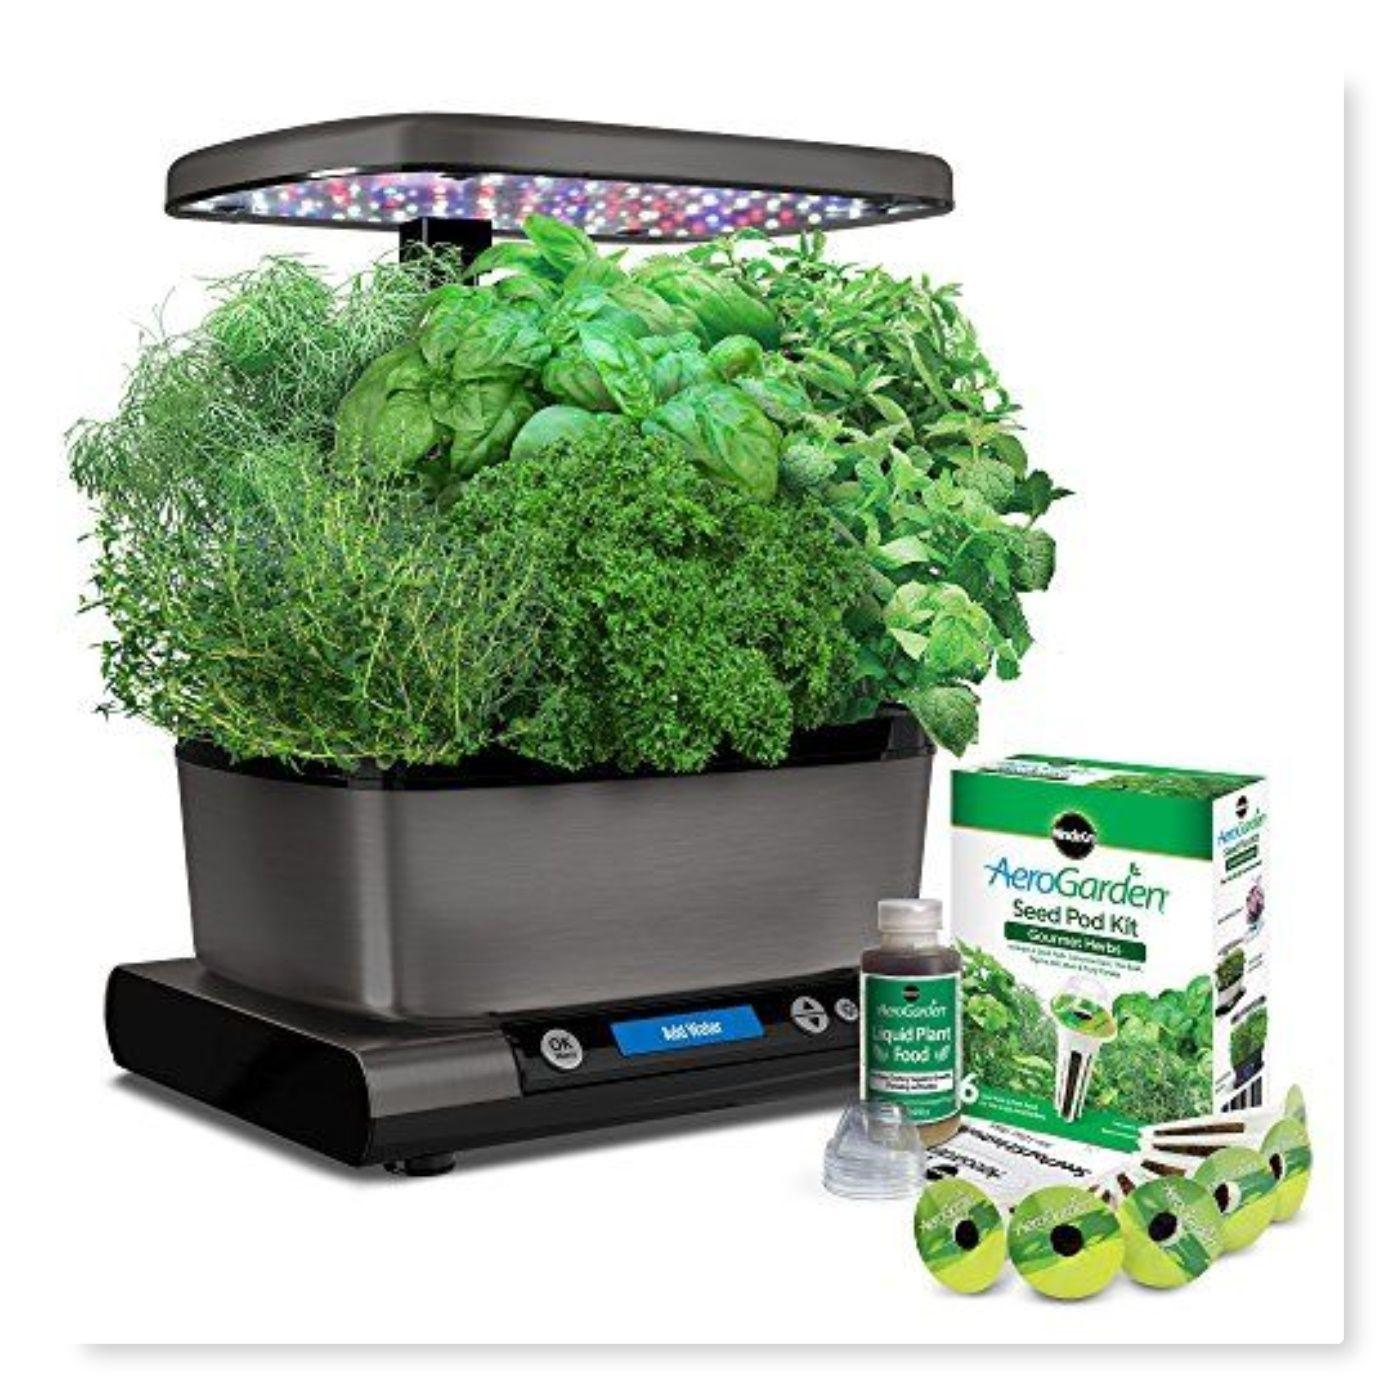 Aerogarden Harvest Elite With Gourmet Herb Seed Pod Kit 640 x 480